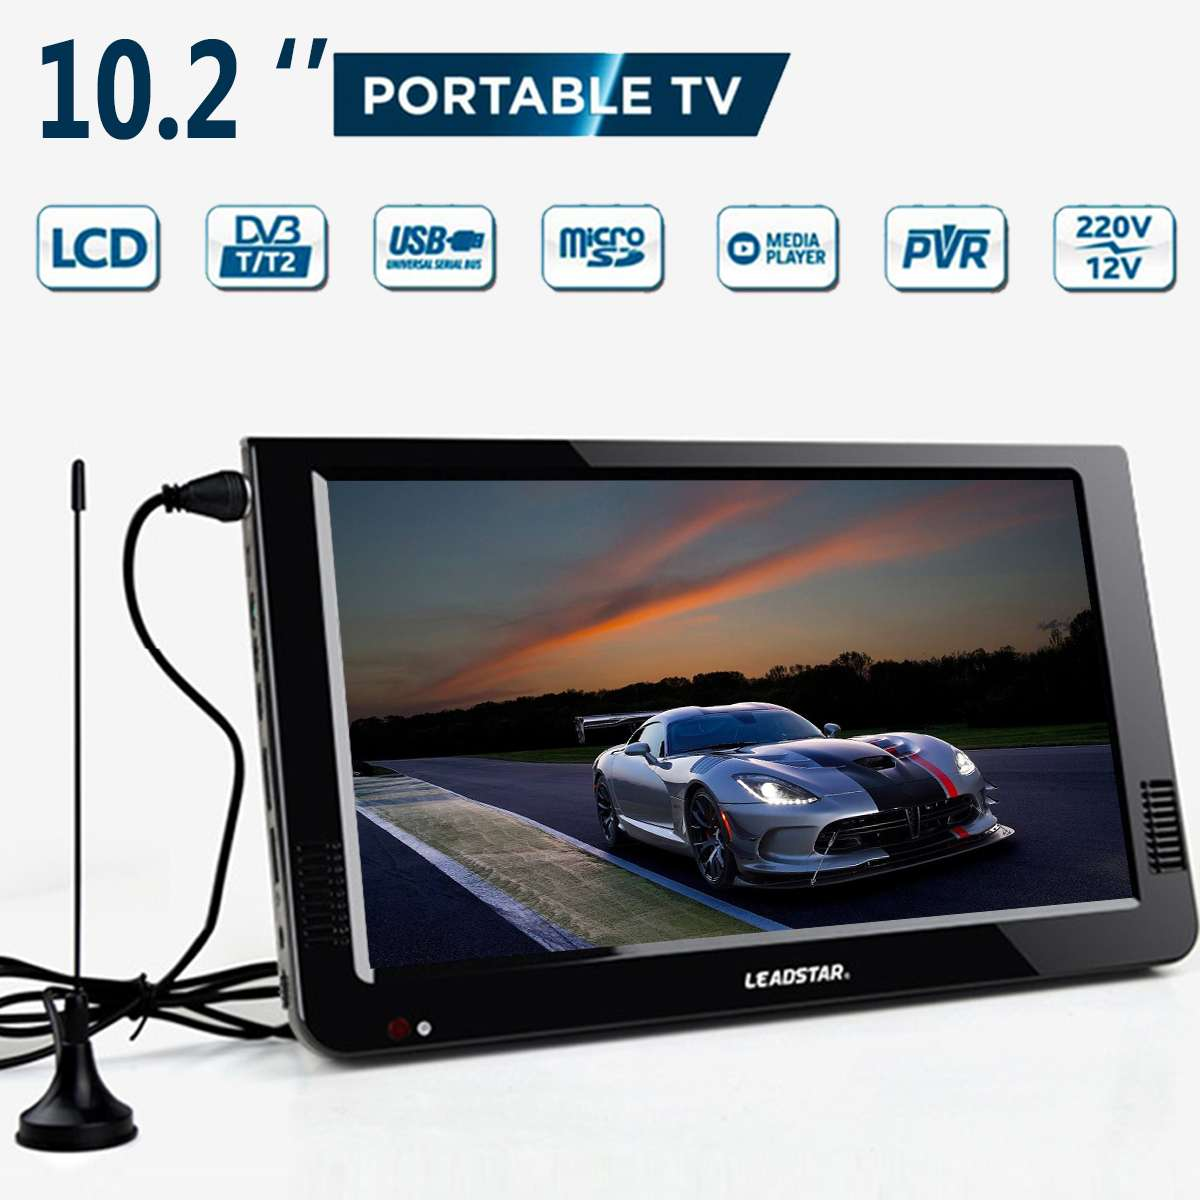 Portable Car Television Outdoor Car 16:9 Digital Analog Television DVB-T / DVB-T2 TFT 10.2'' LED-LCD HD TV Support TF Card Audio